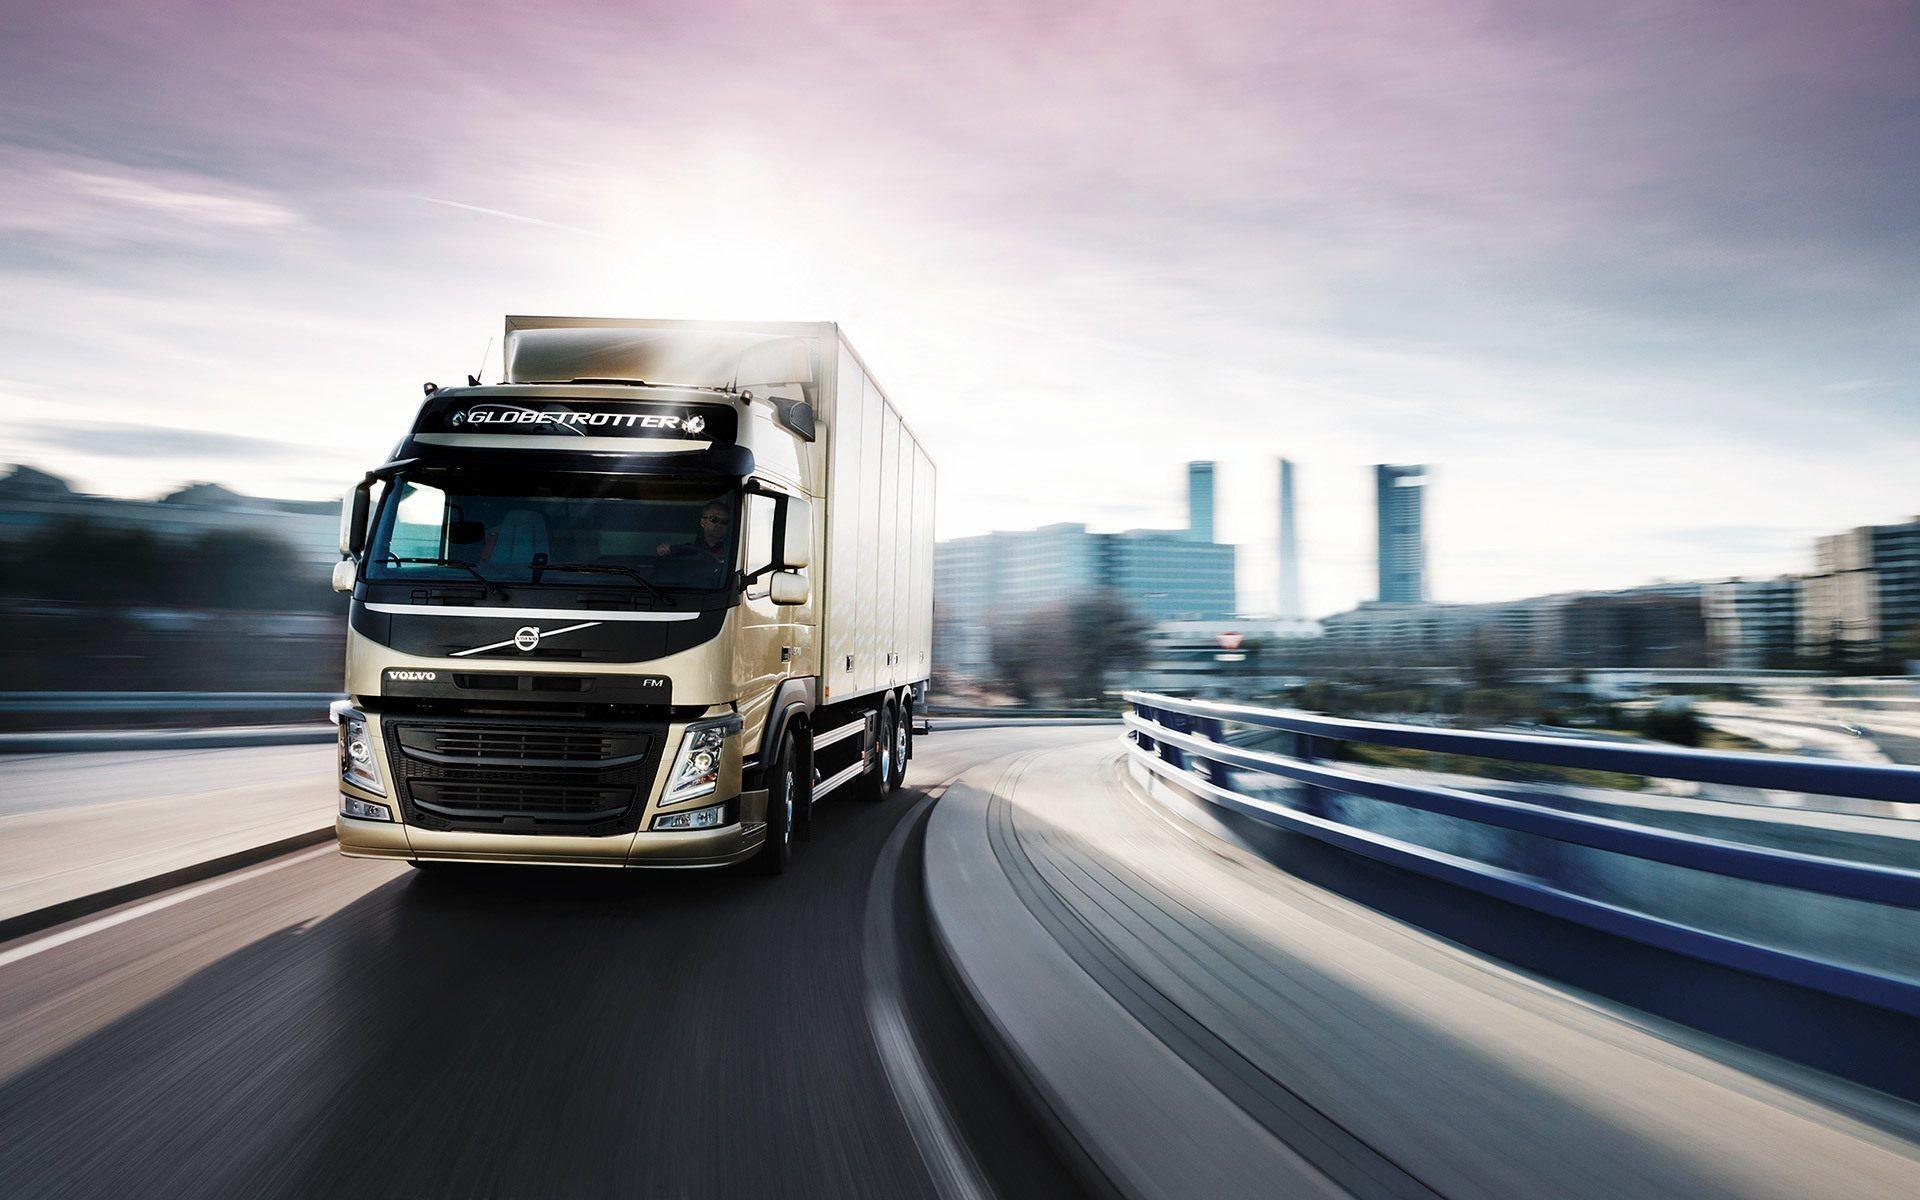 Truck Wallpapers High Resolution ①